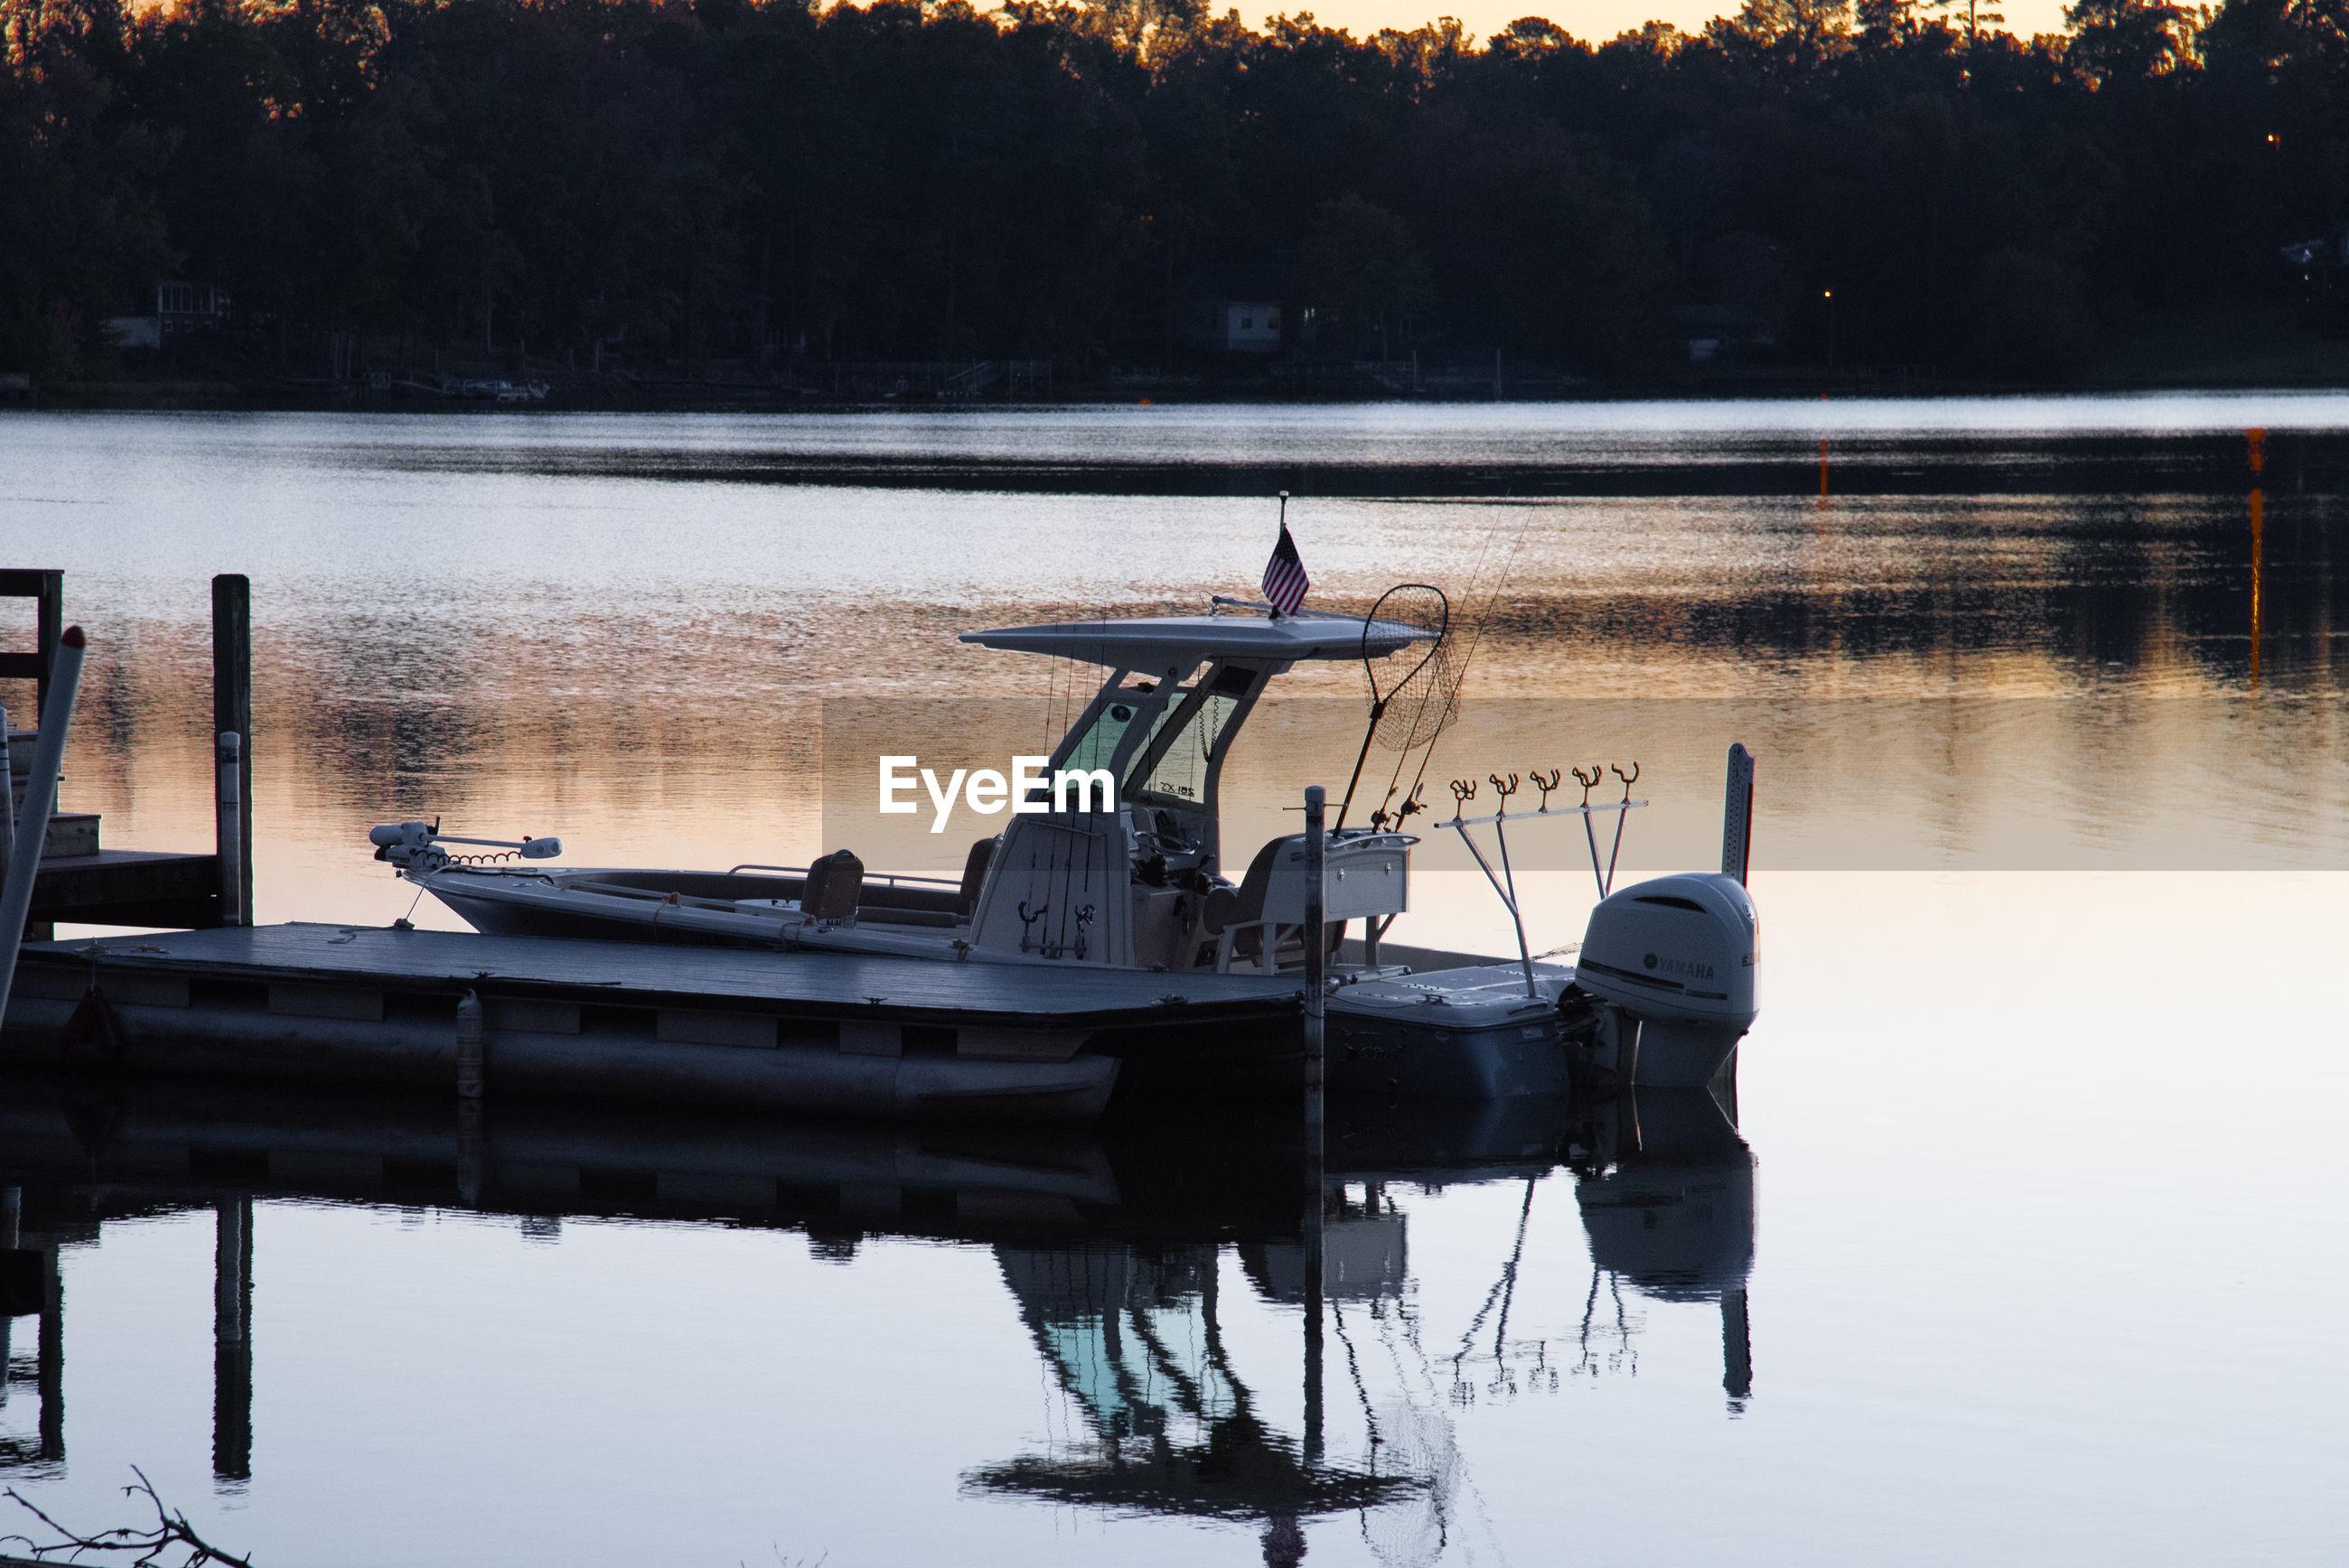 BOAT MOORED AT LAKE AGAINST SKY